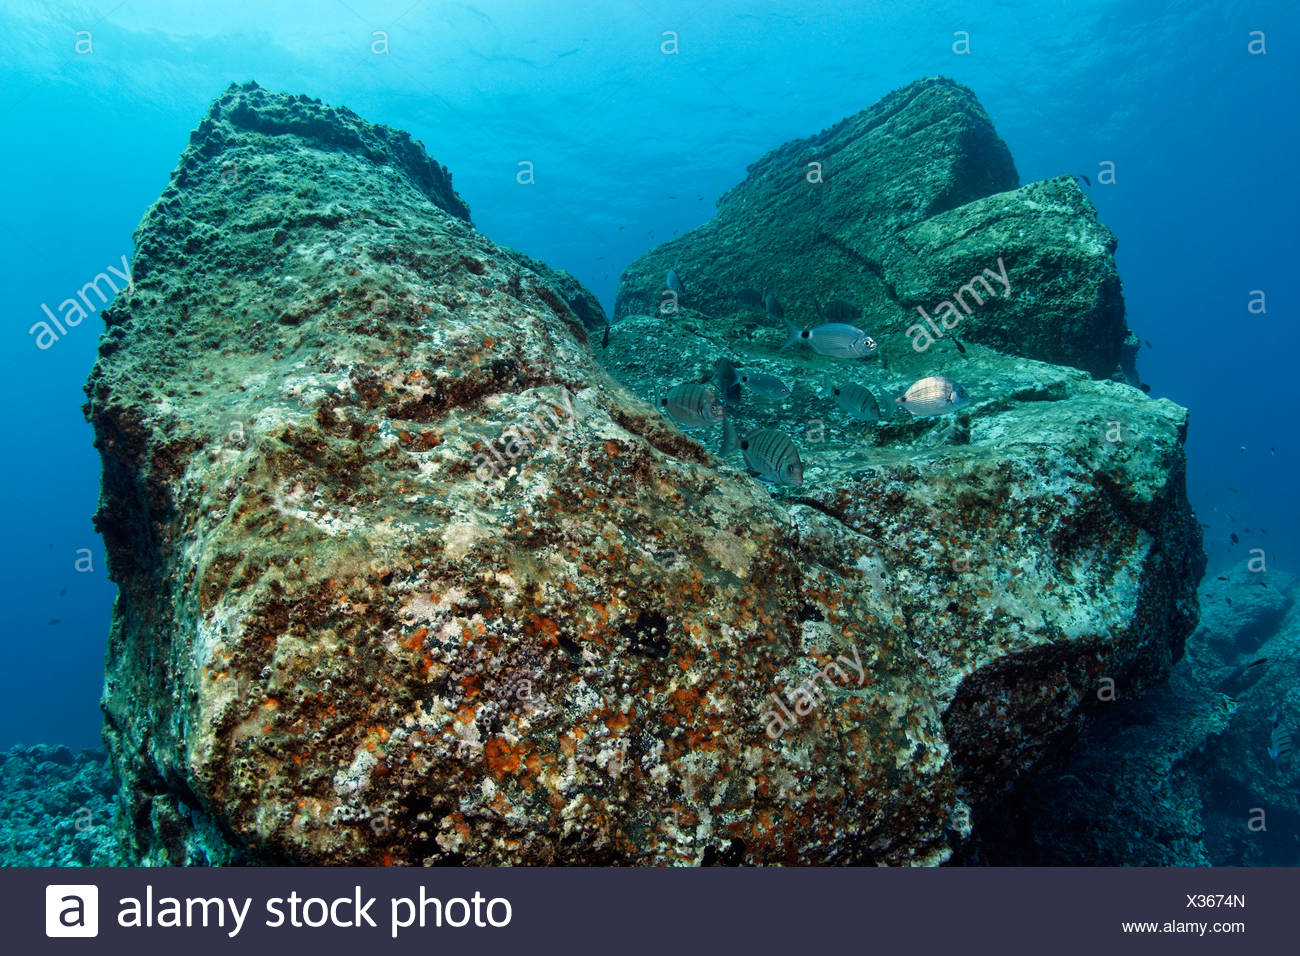 Rock with Acorn Barnacles (Balanus trigonus) and African White Seabream or Sargo (Diplodus sargus cadenati), Madeira, Portugal Stock Photo